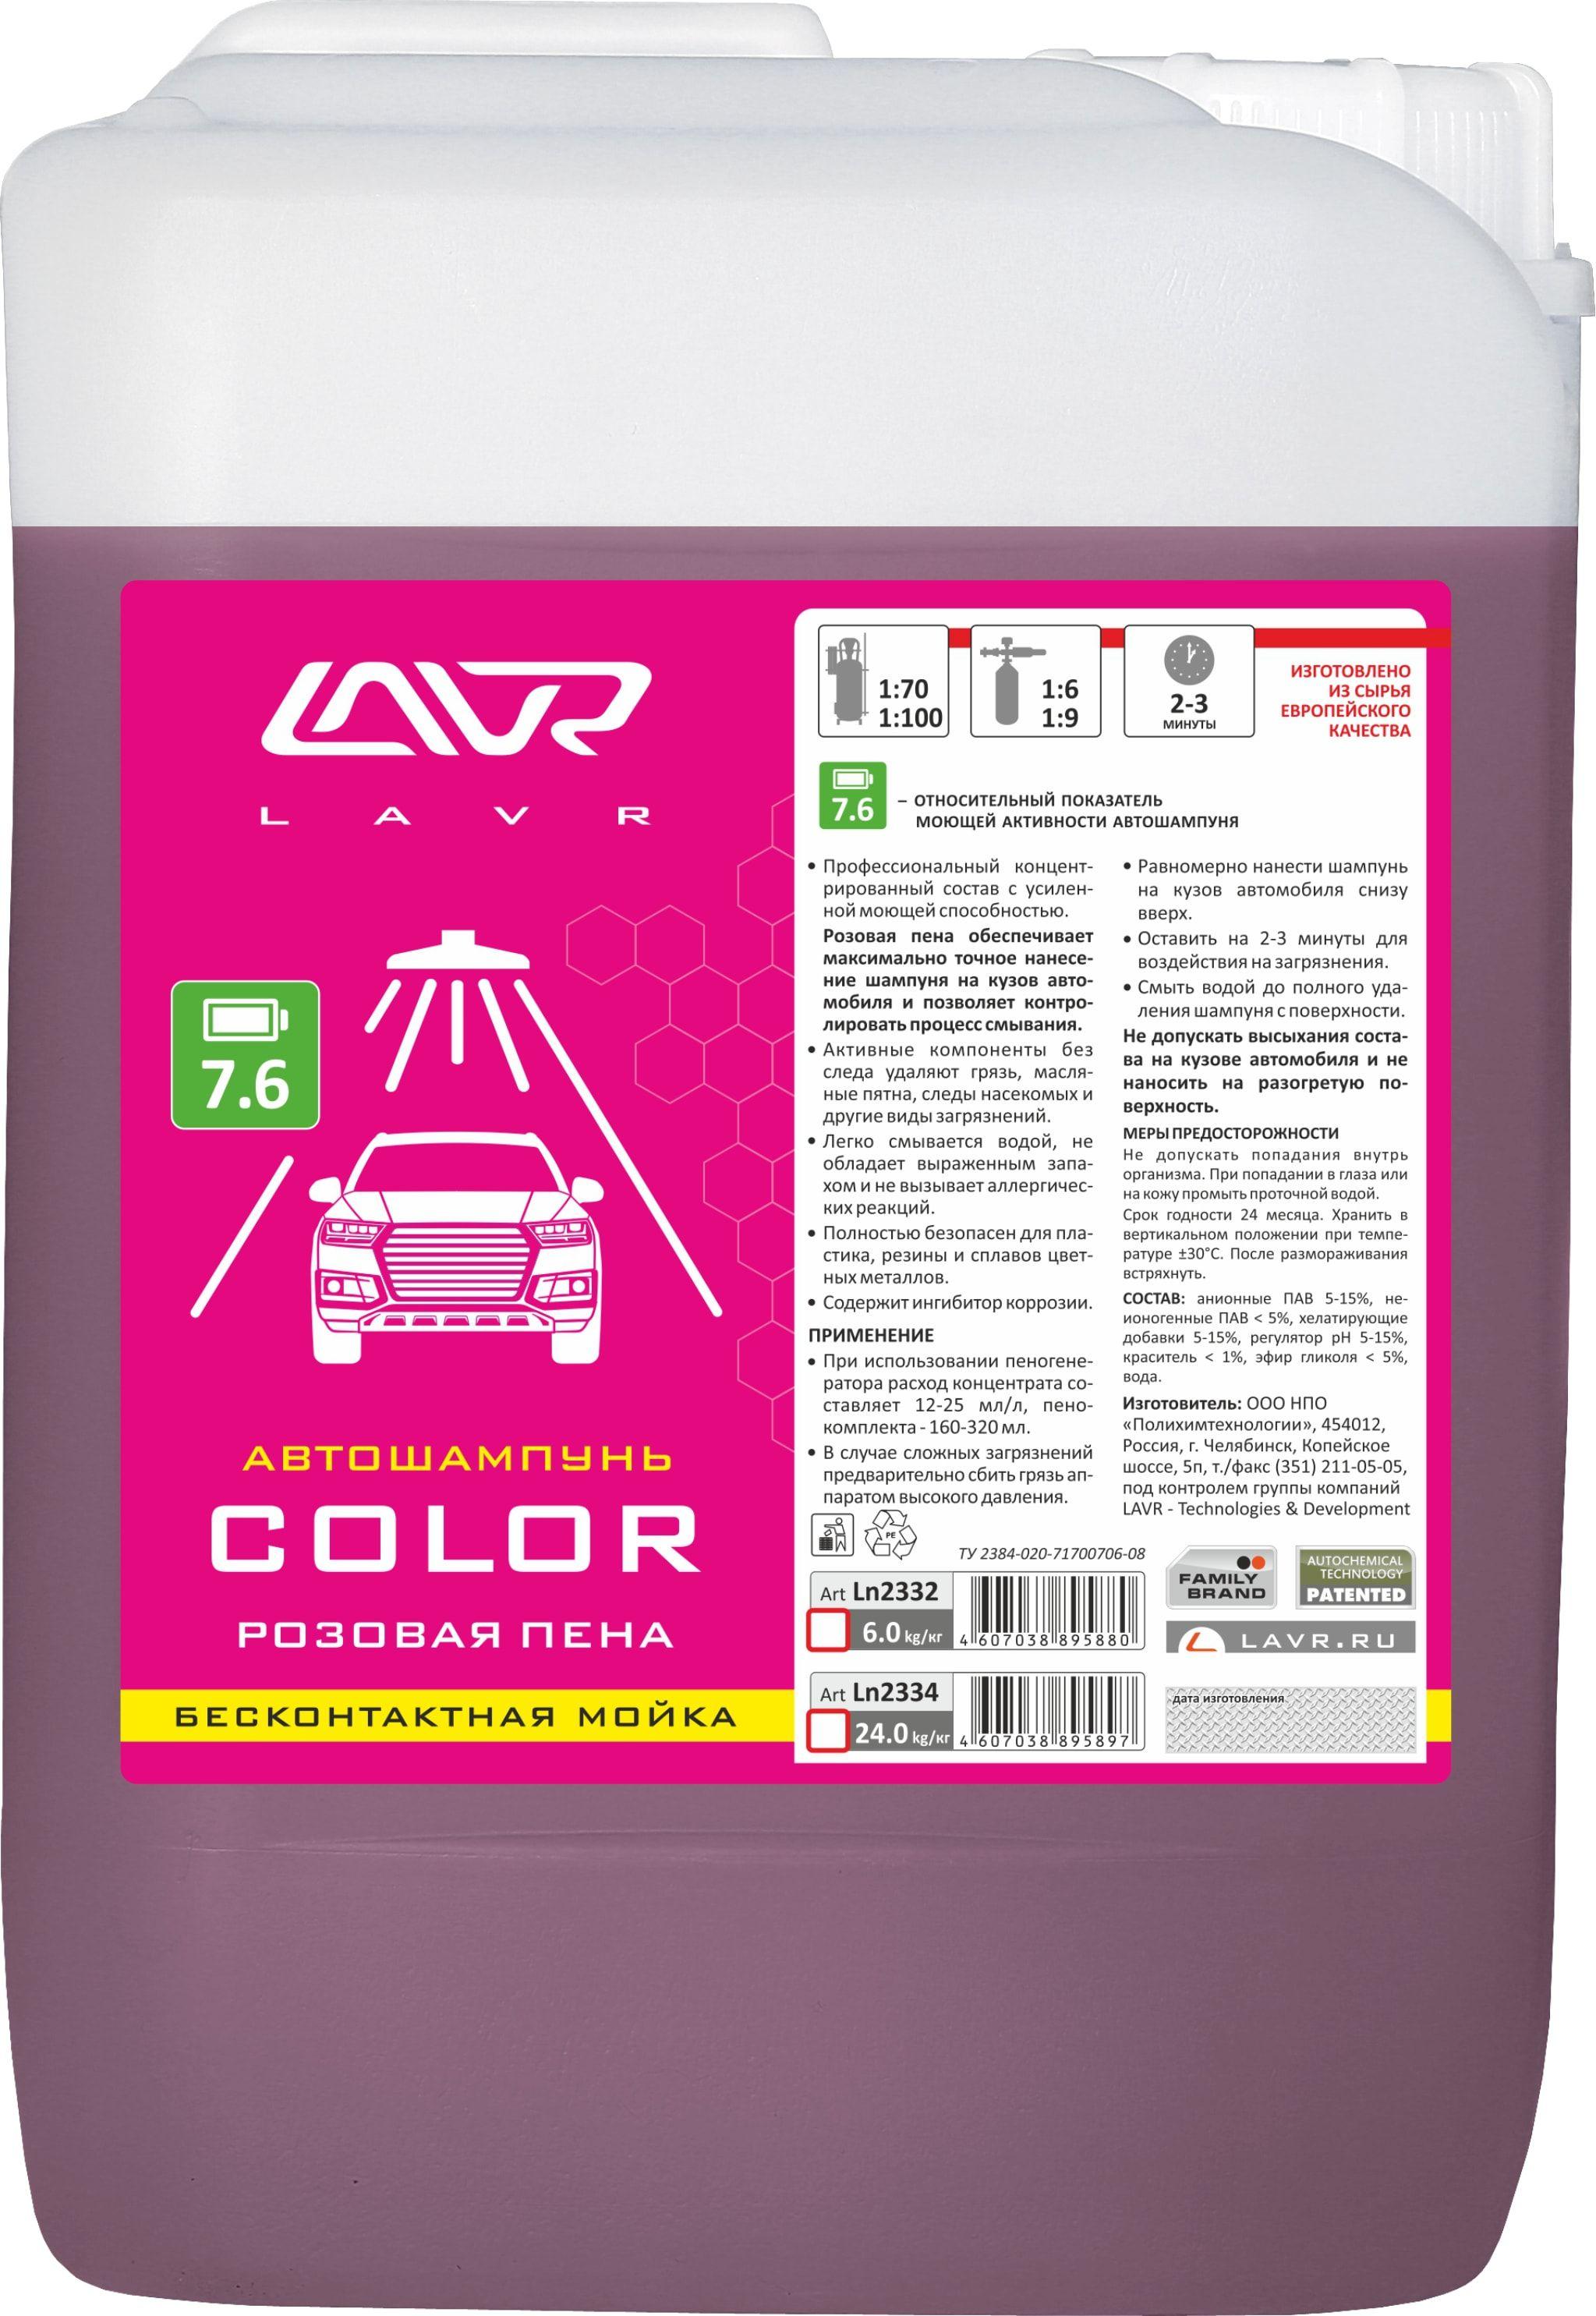 Автошампунь для б/мойки Lavr Color розовая пена 6 л Ln2332